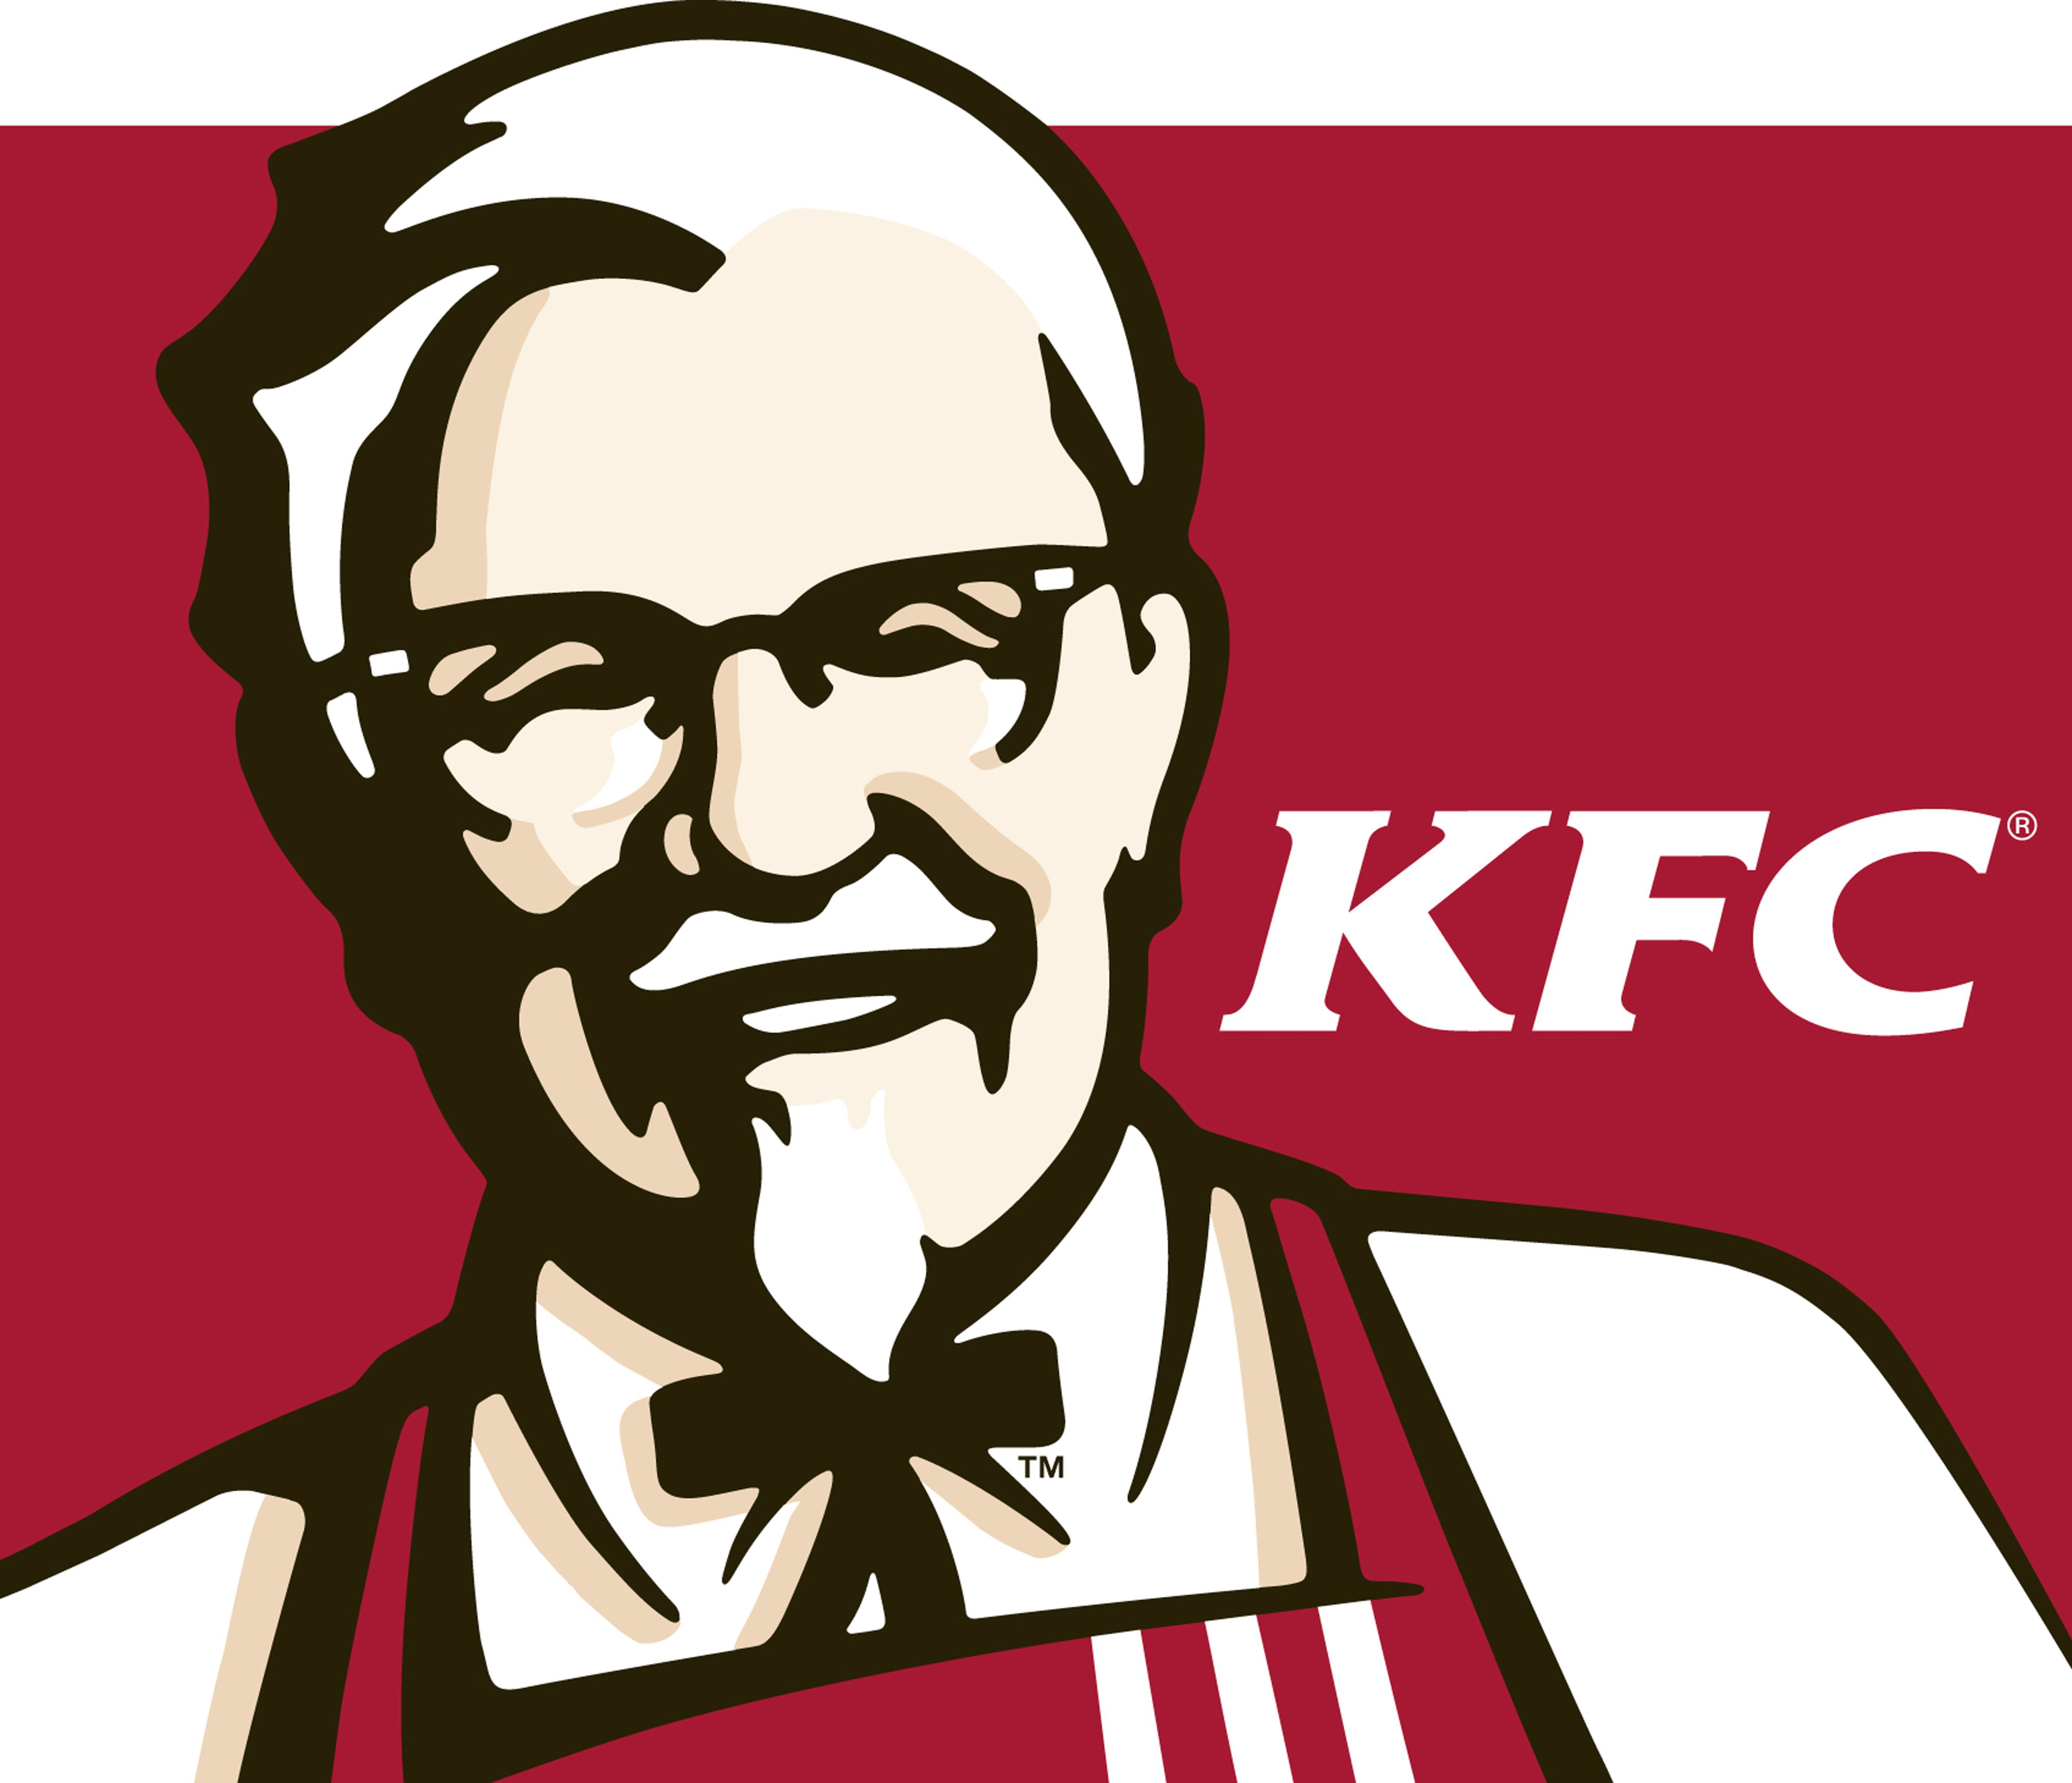 Kf logo clipart clip art royalty free download KFC | Logos | Kfc, Fast food restaurant, Kentucky fried clip art royalty free download